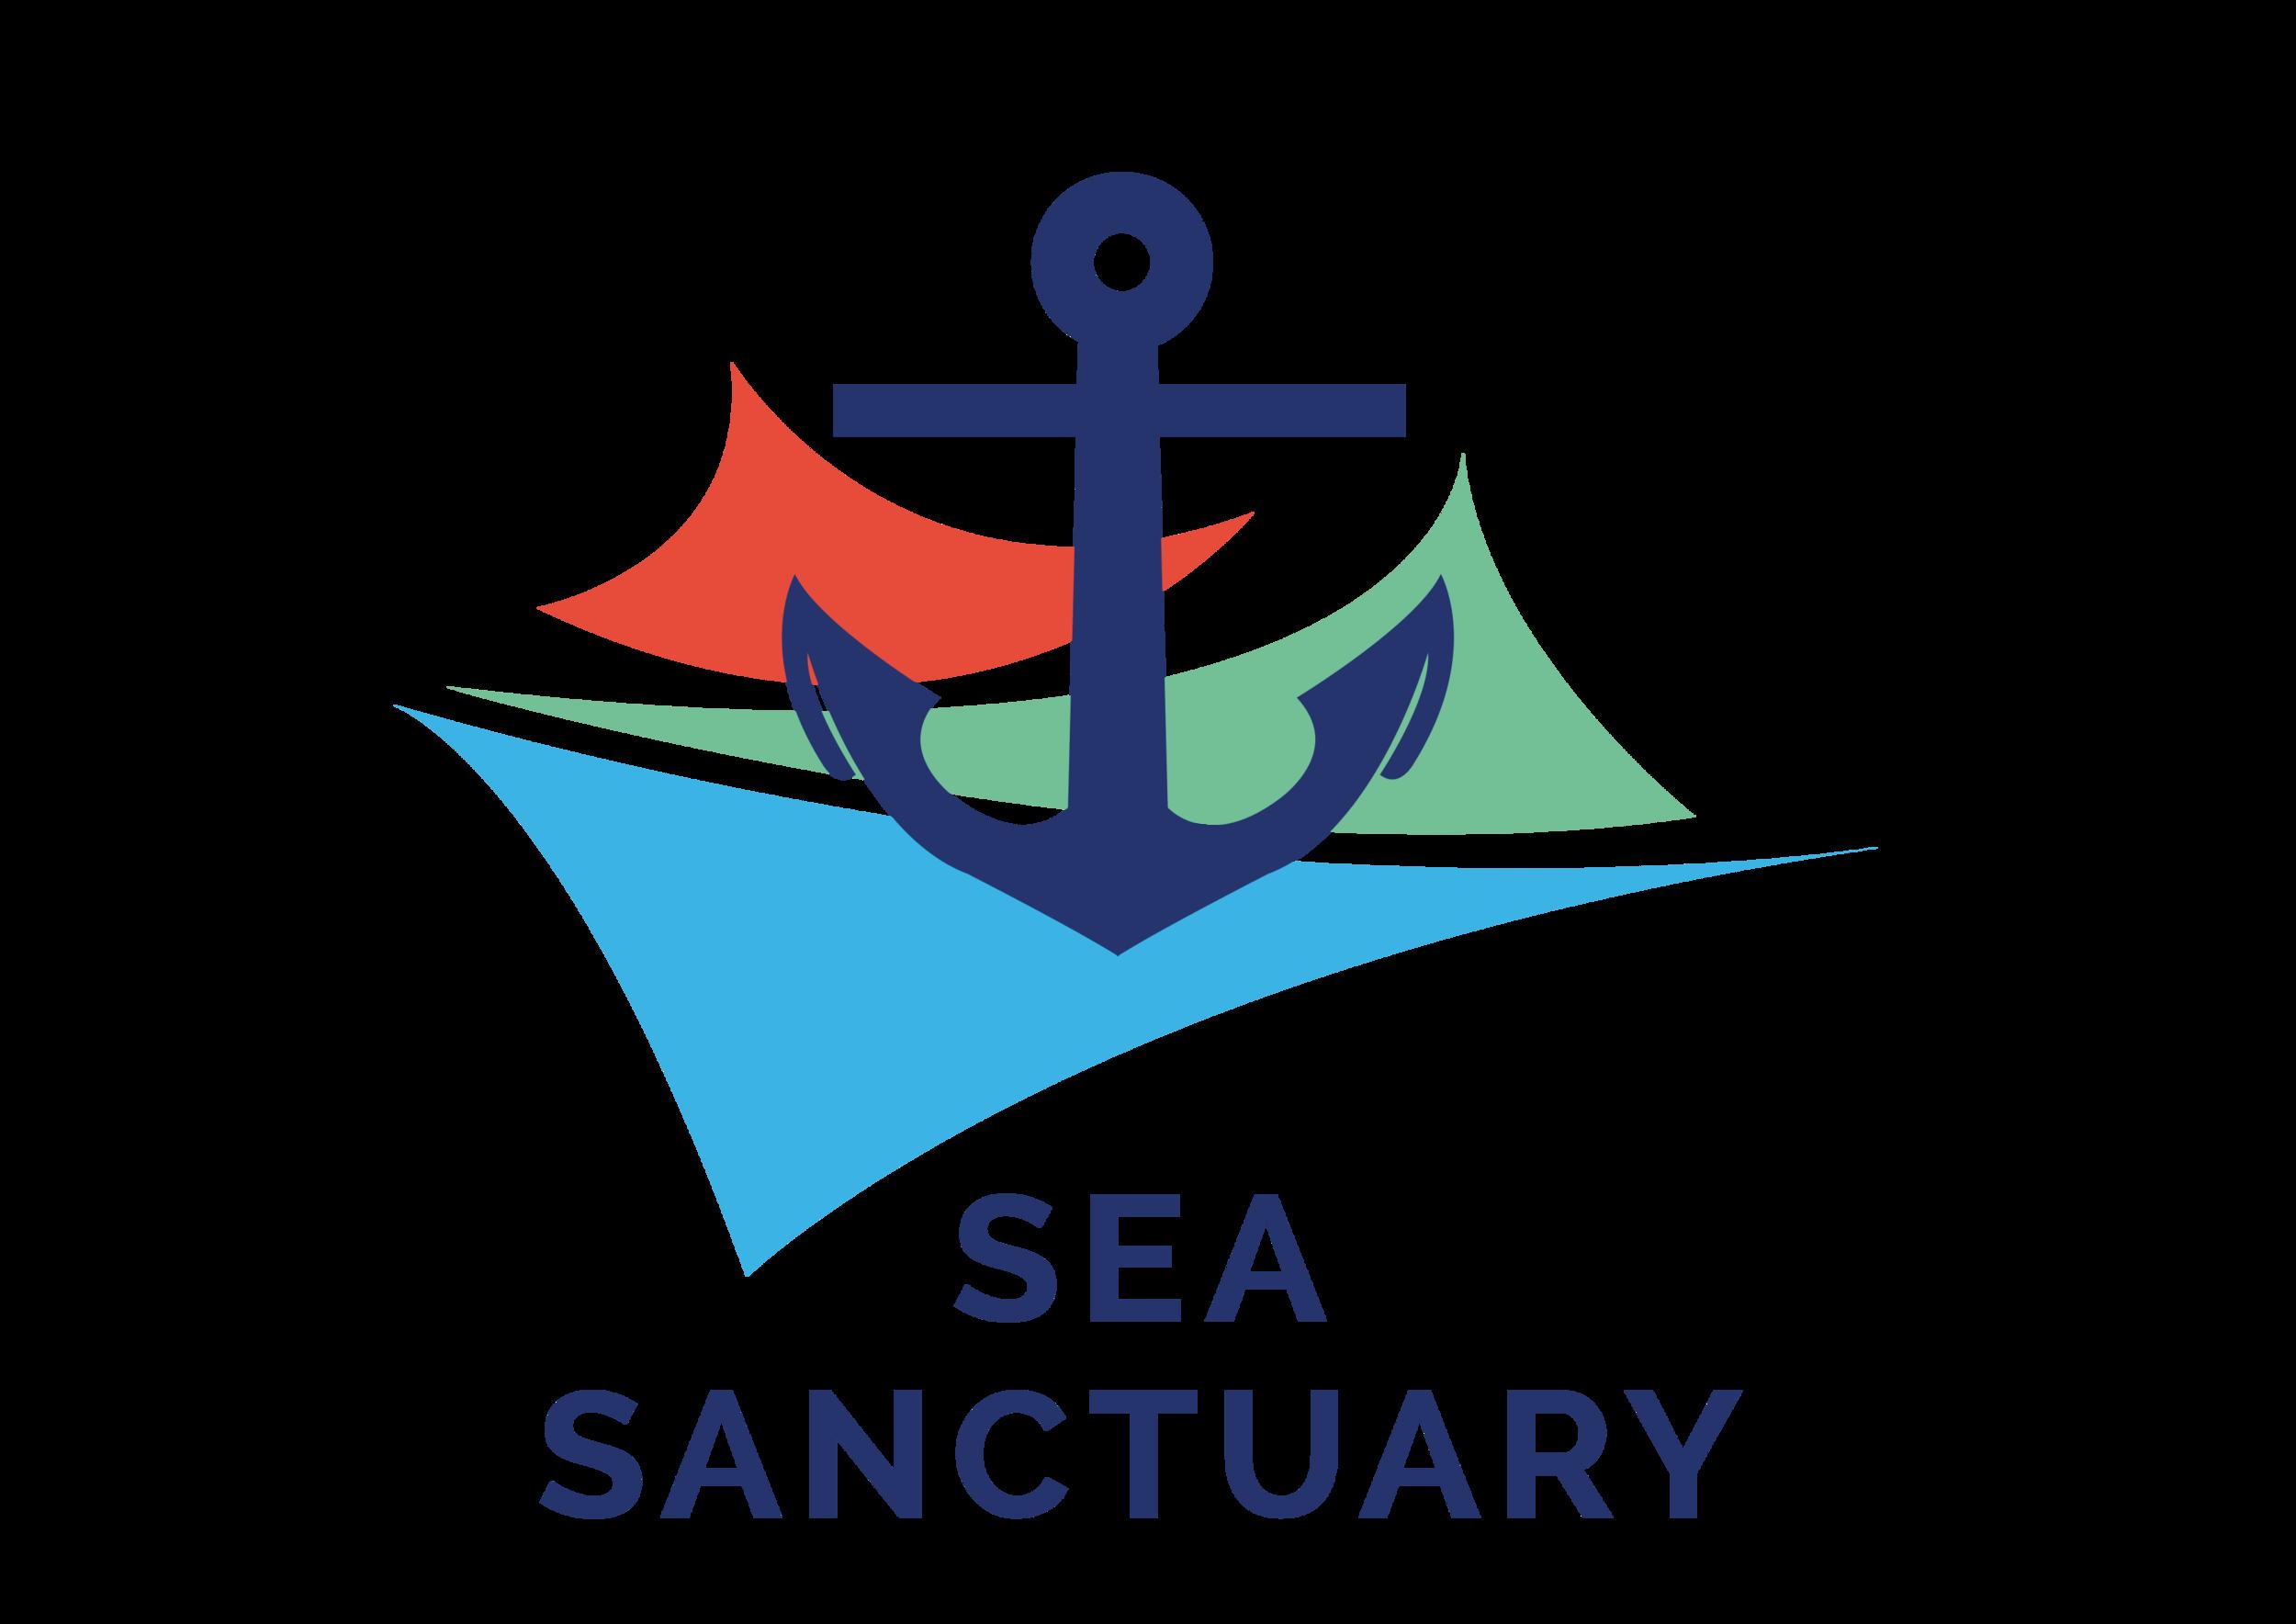 SS logo transparent background.png